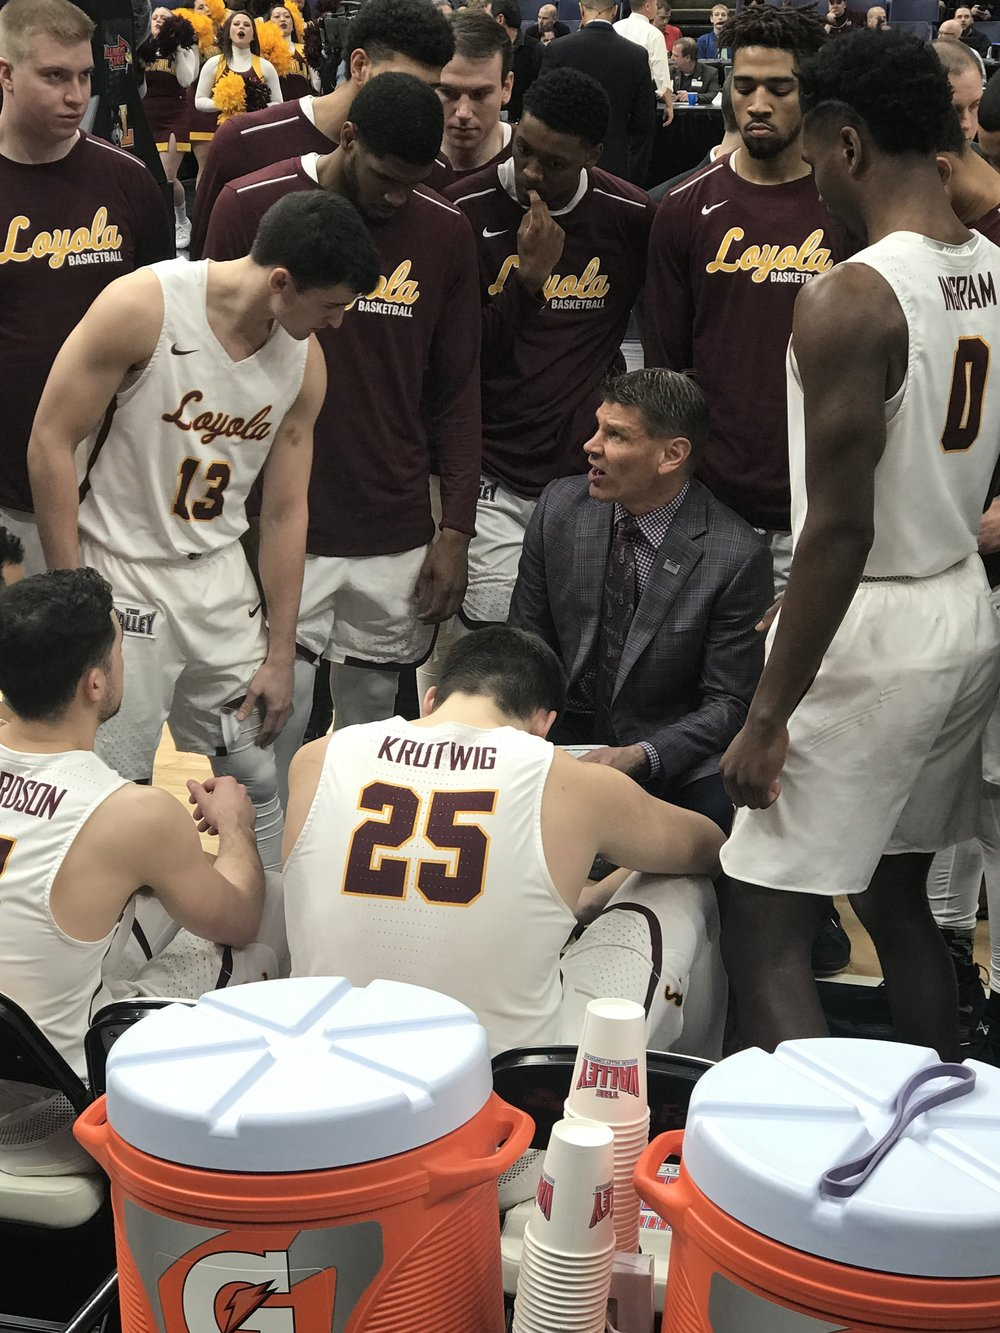 Loyola University's basketball team